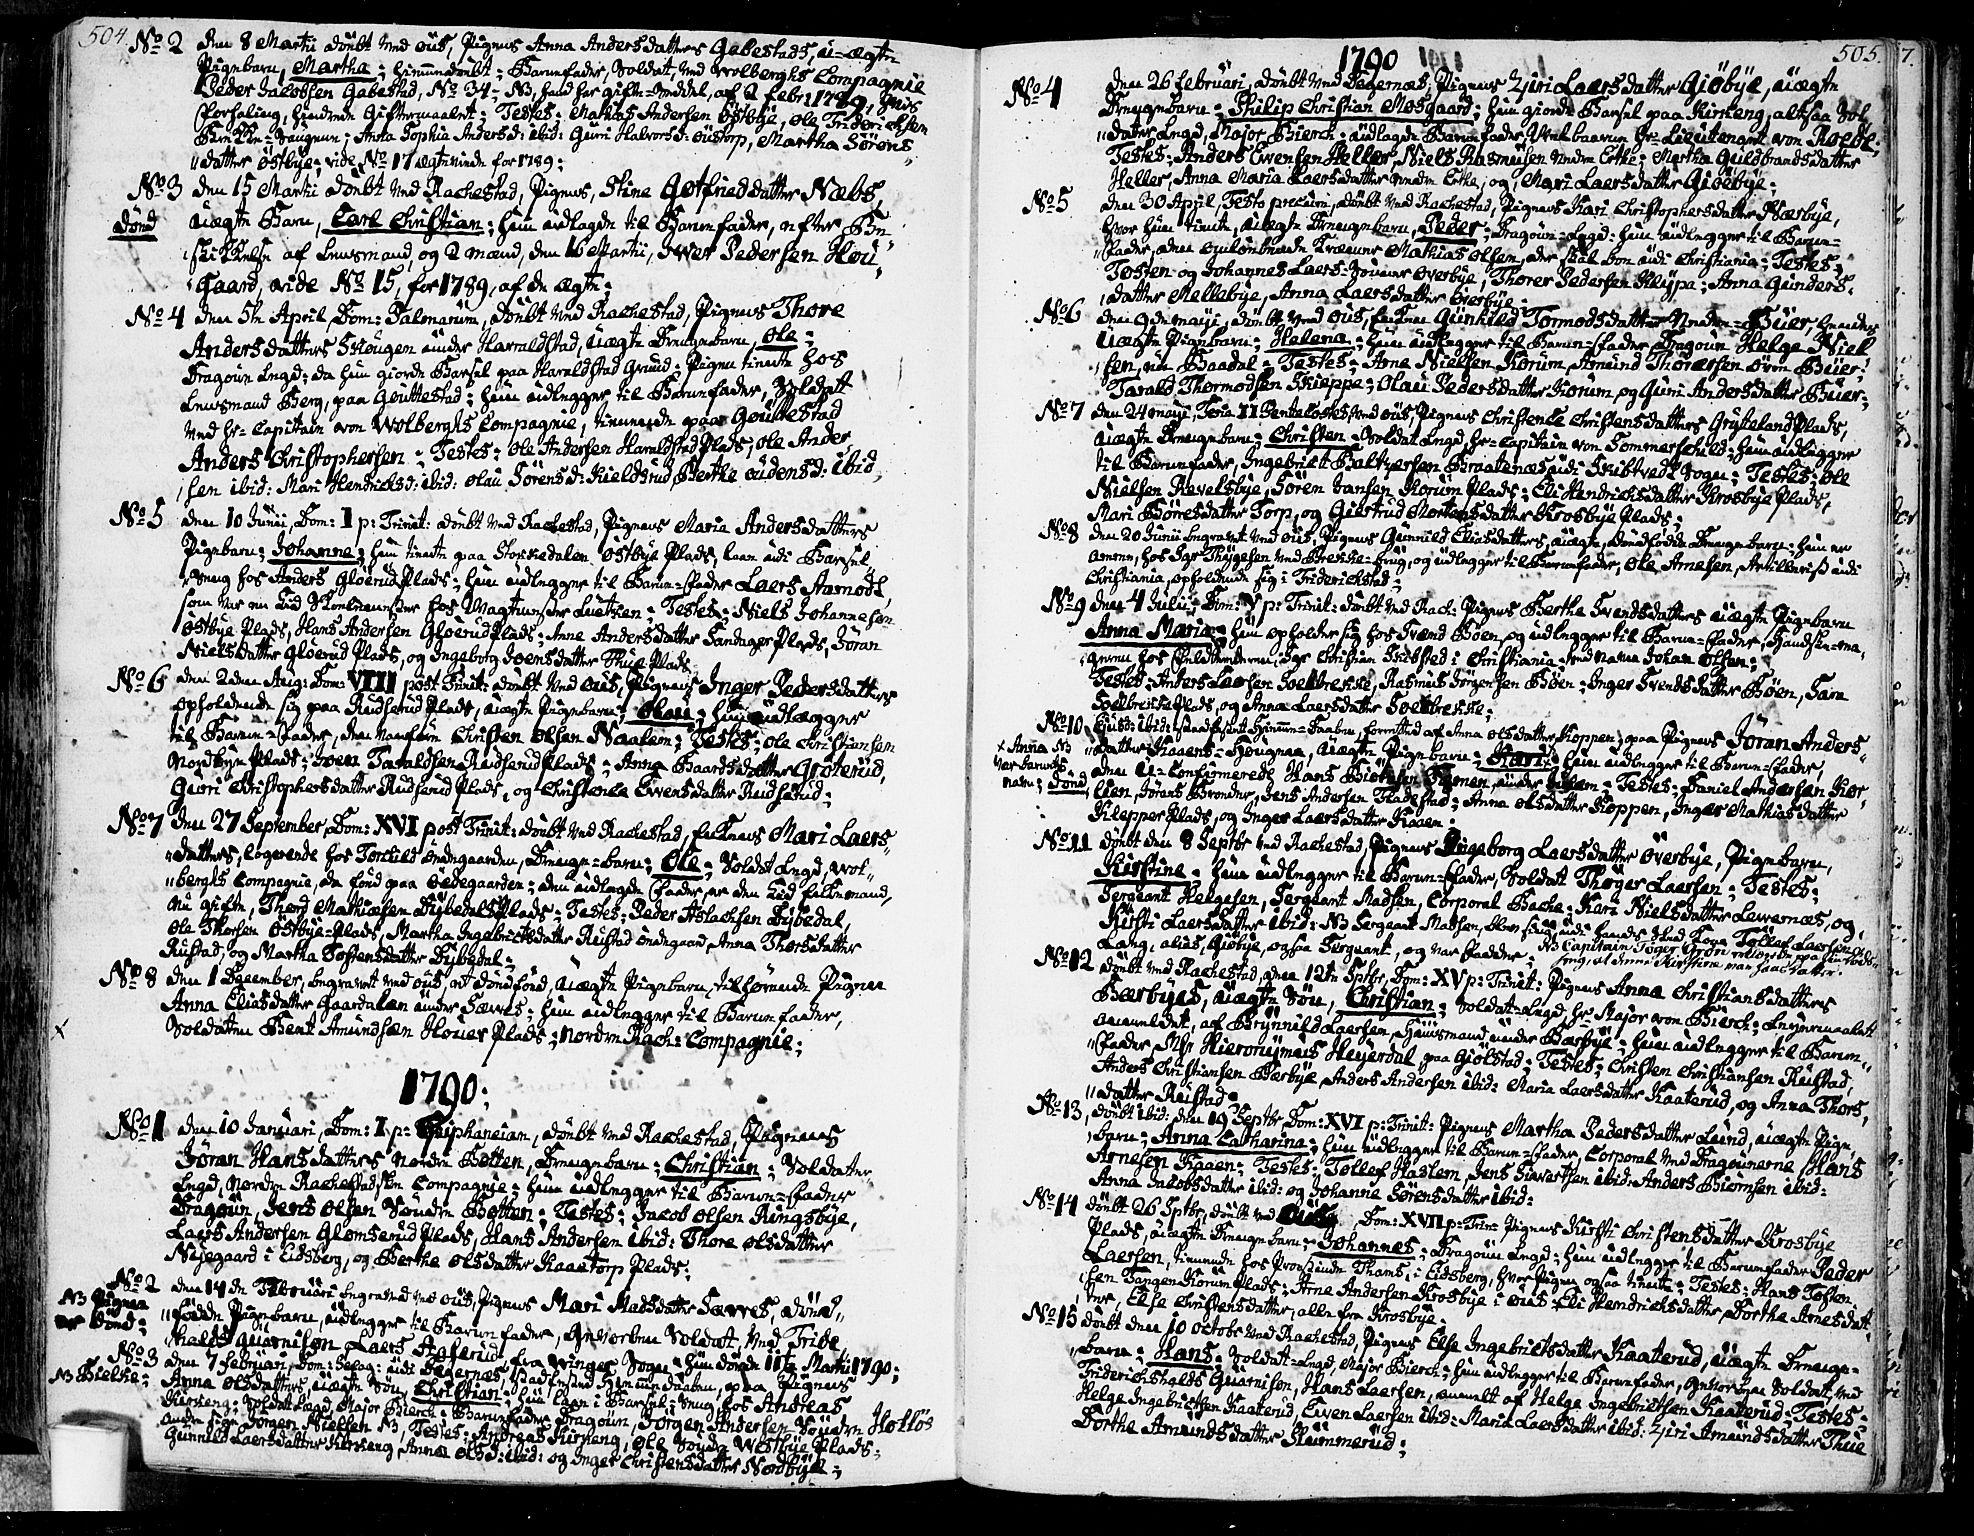 SAO, Rakkestad prestekontor Kirkebøker, F/Fa/L0005: Ministerialbok nr. I 5, 1784-1814, s. 504-505